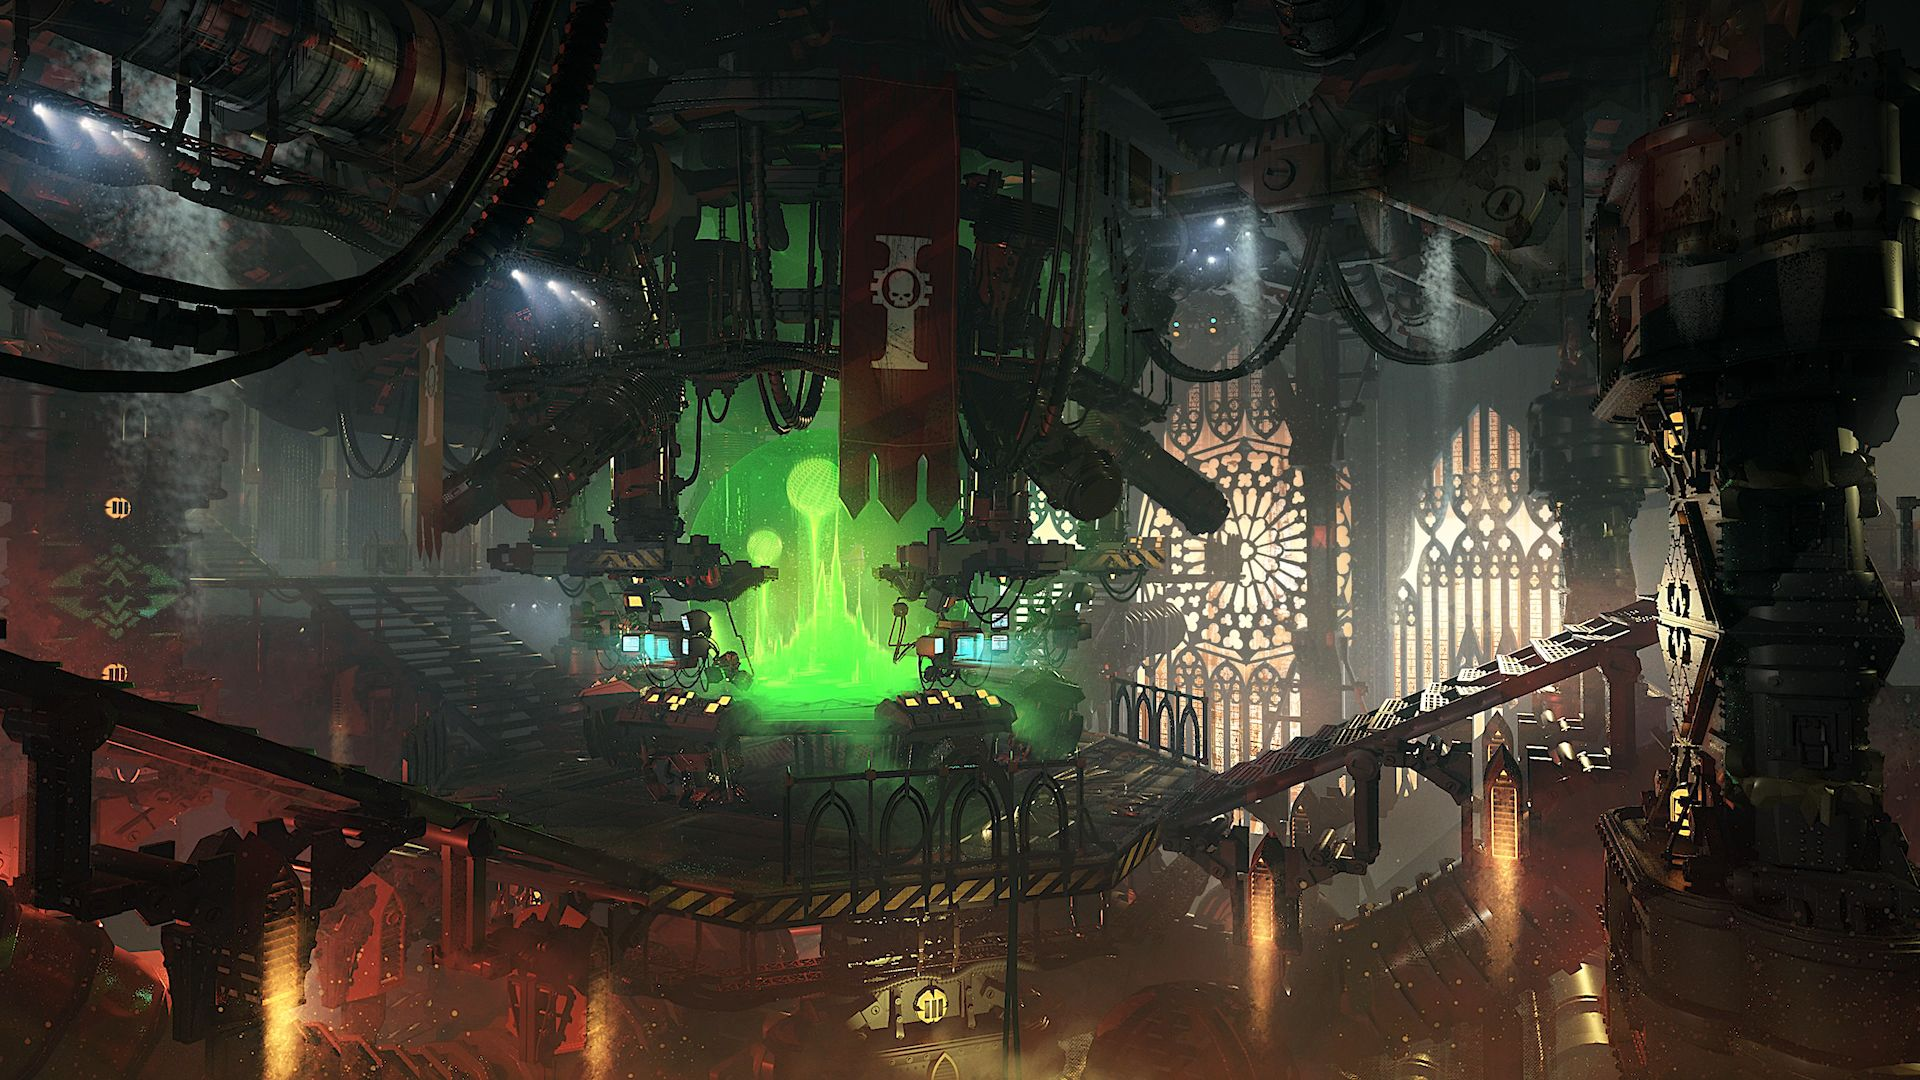 Darktide's hub, with a bank of monitors inside a starship